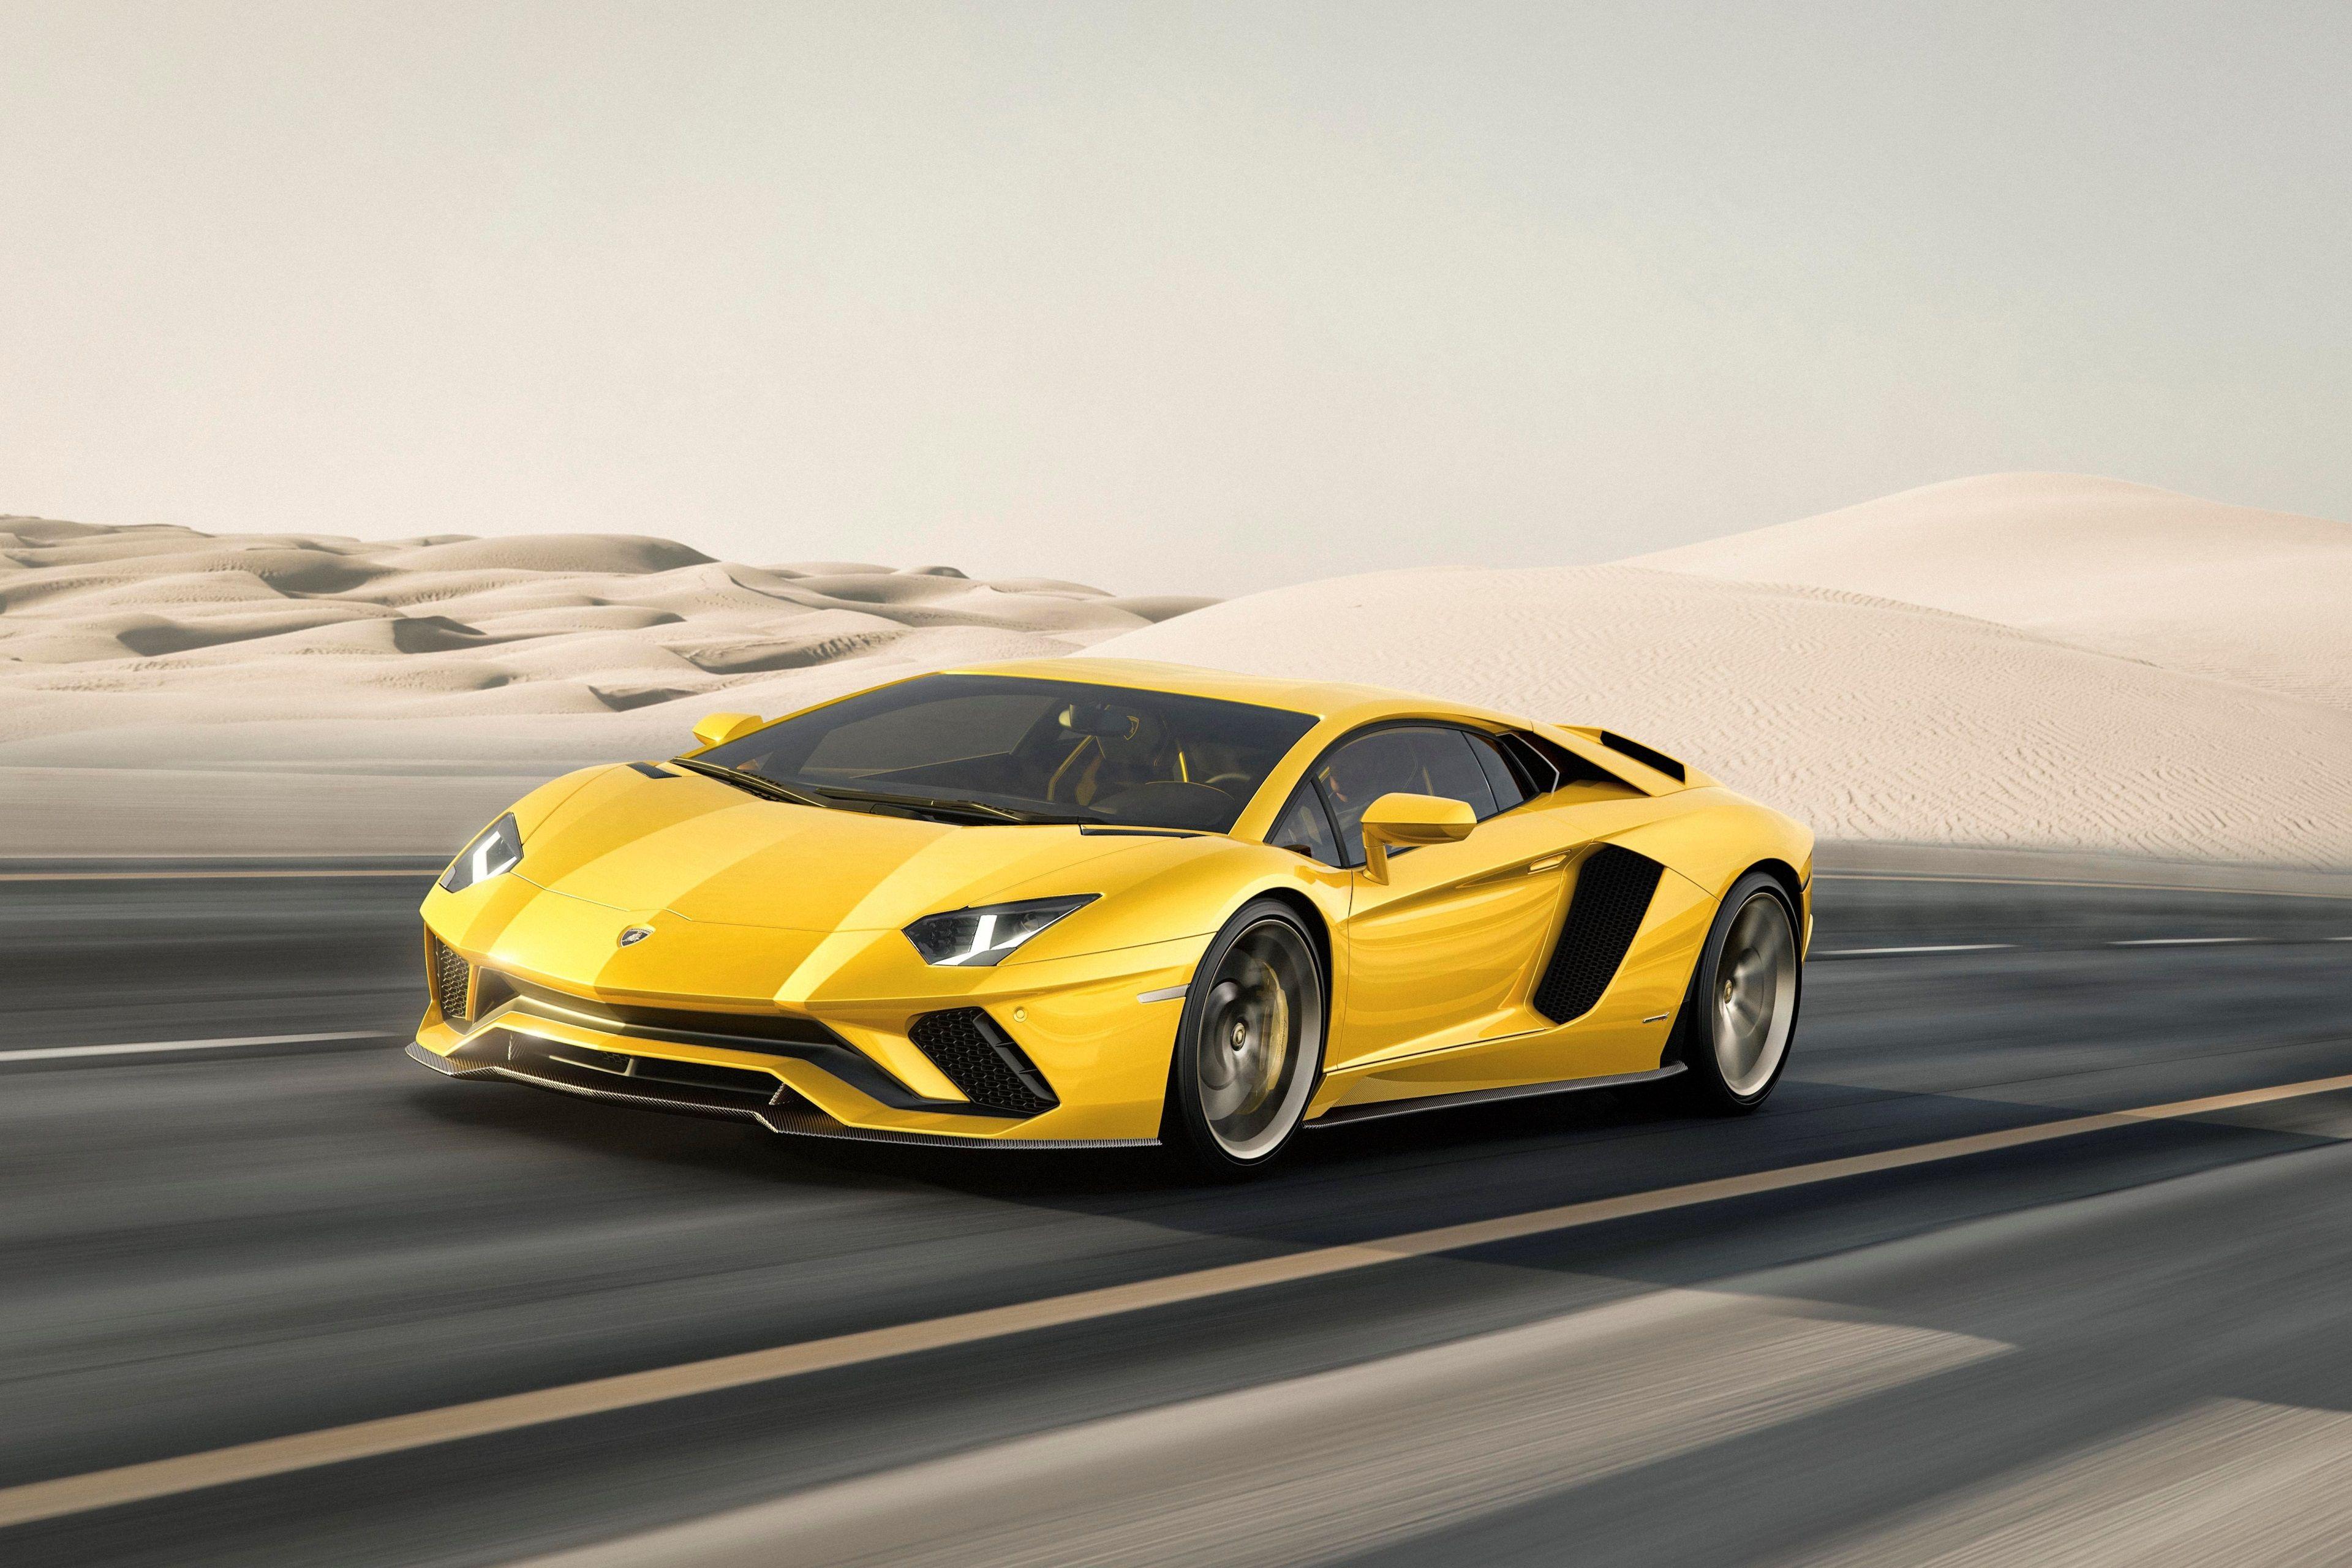 3840x2560 Lamborghini Aventador S 4k Free Download Beautiful